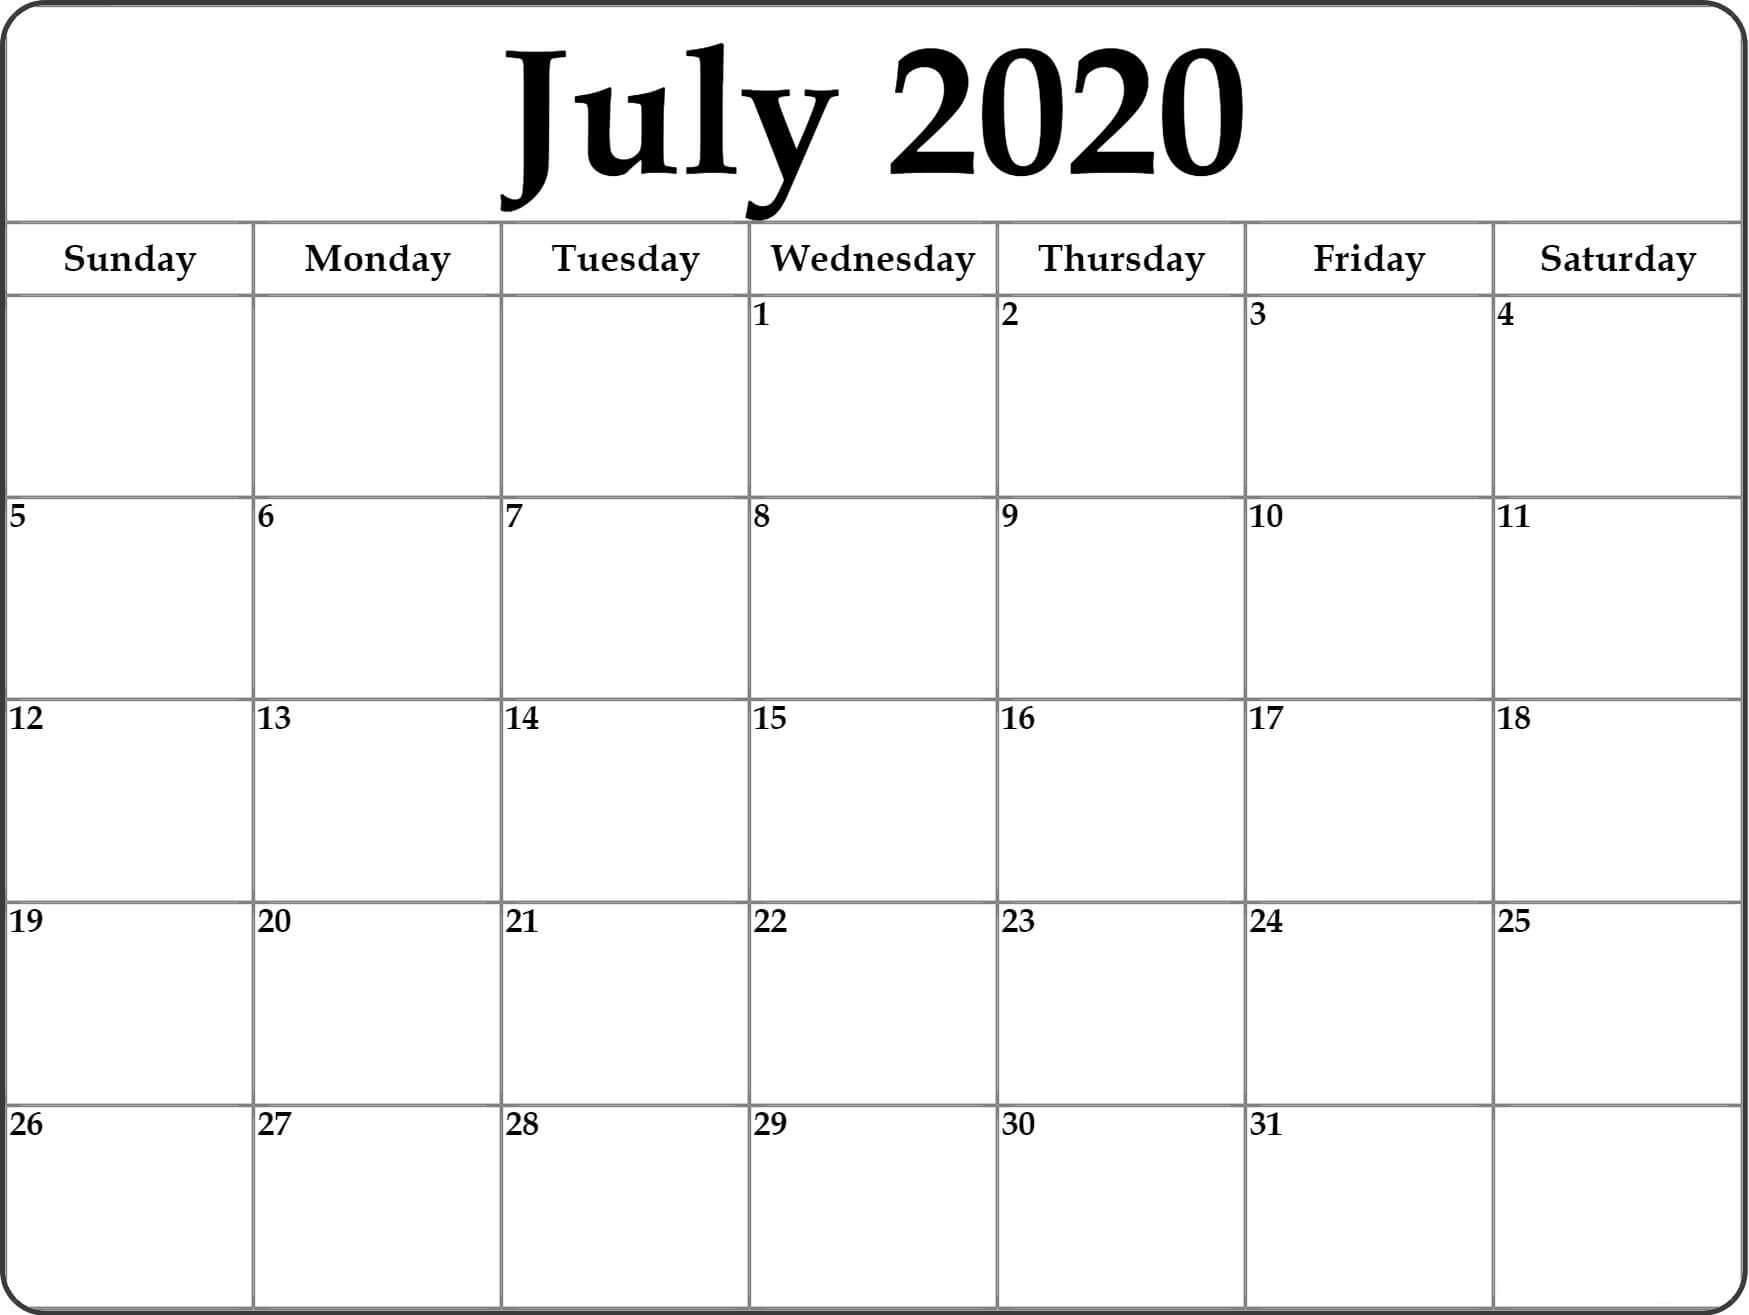 PDF July 2020 Calendar Wallpaper